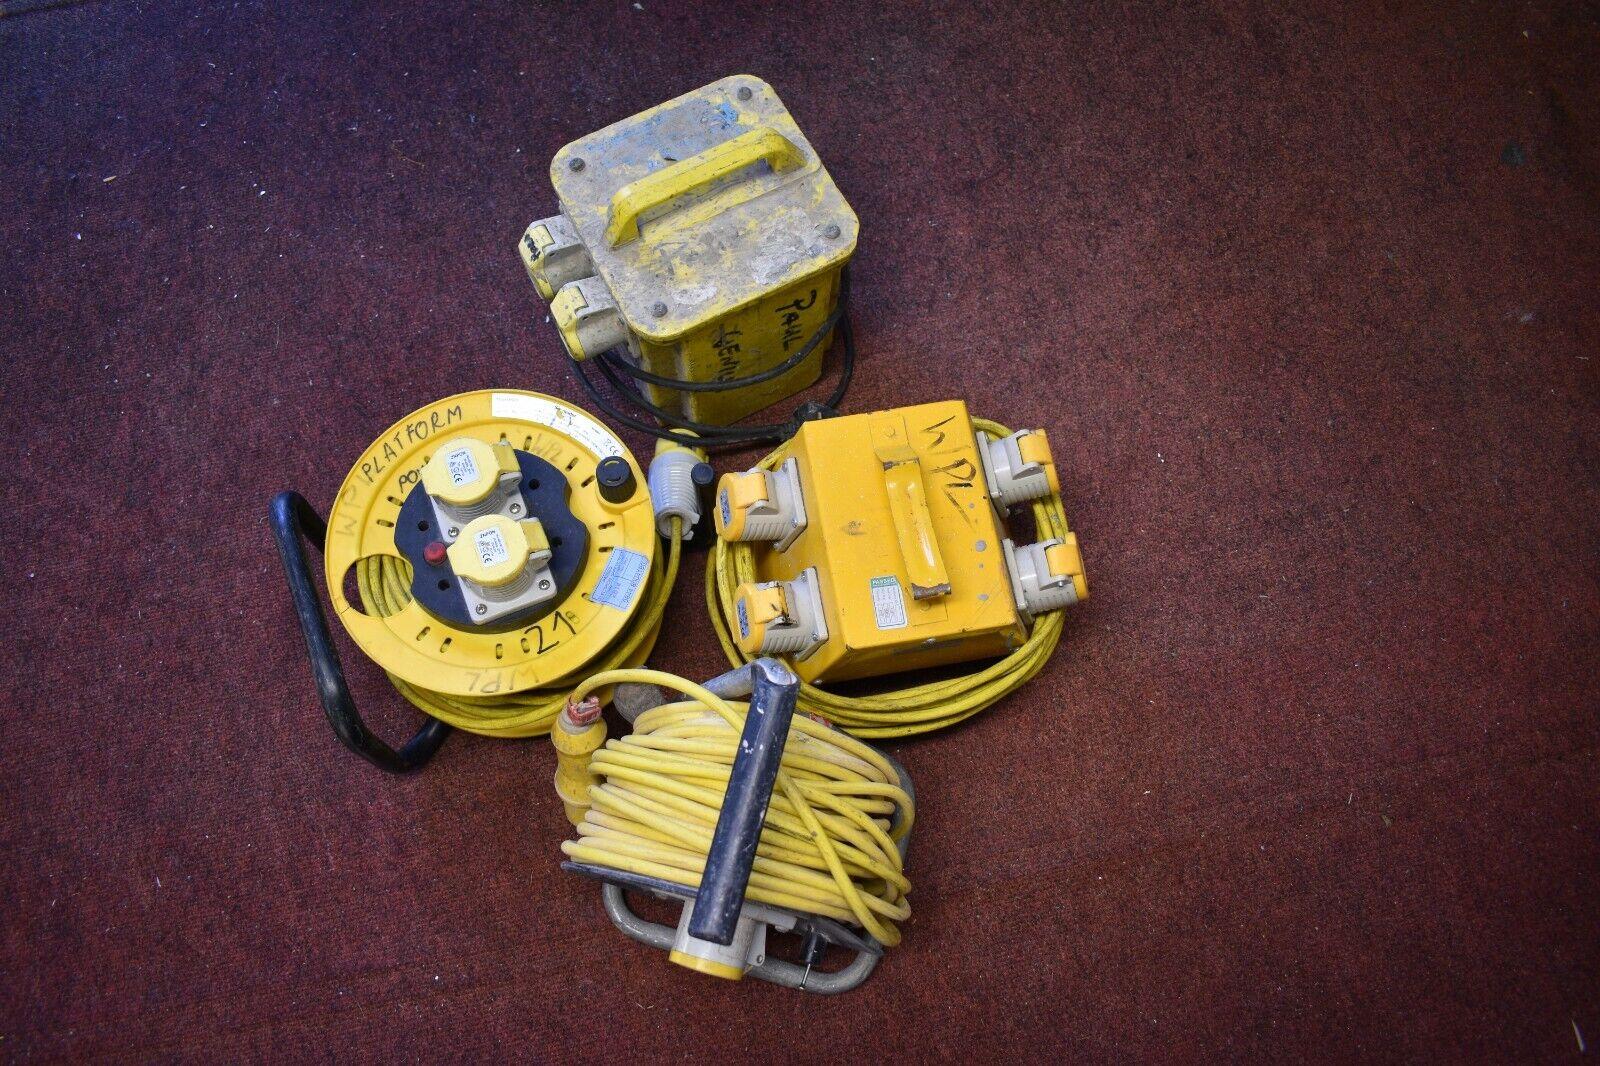 110V Transformer, Extension Lead and Splitter - Lot 3